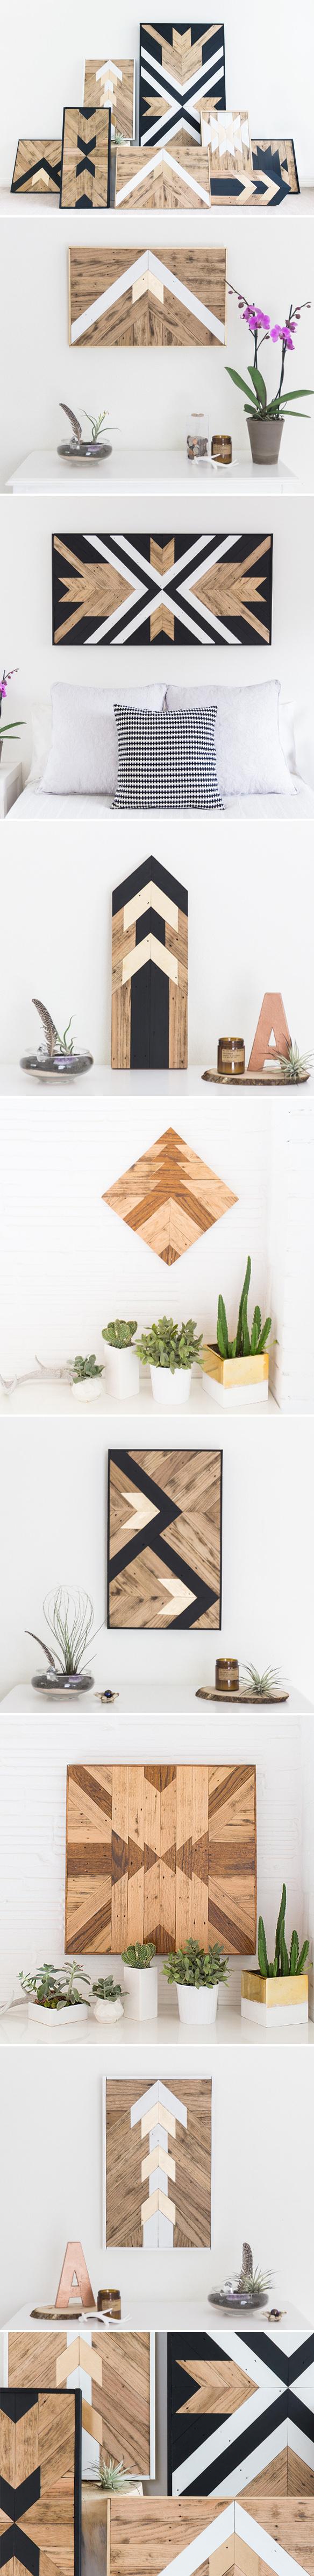 wood-wall-decor-13